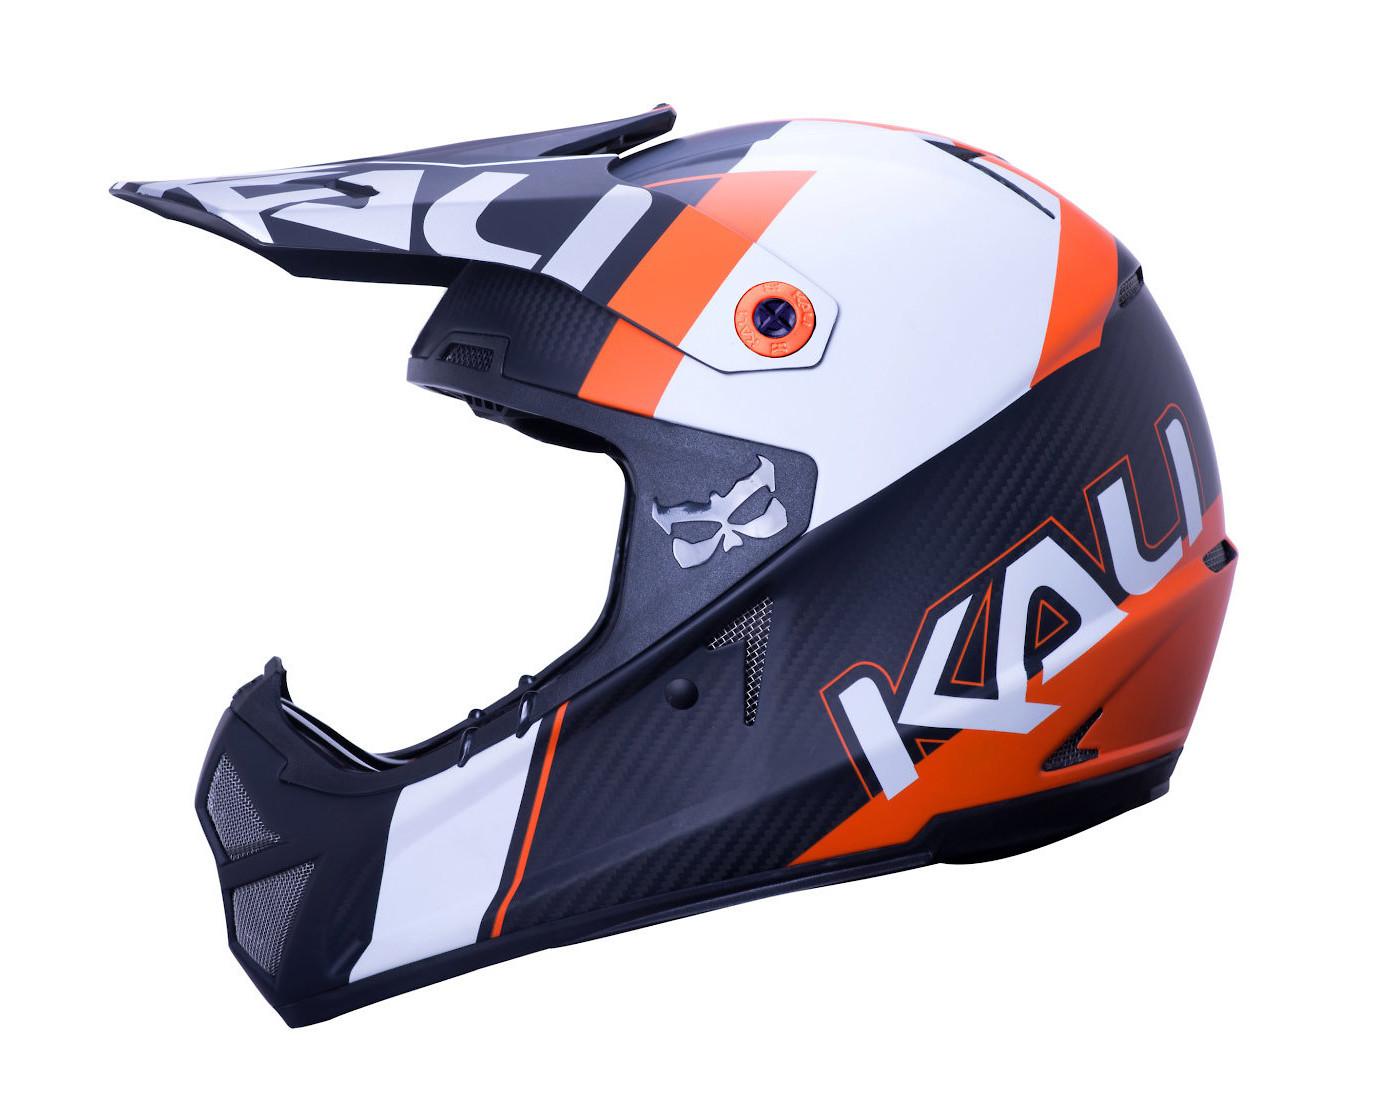 Kali Protectives Shiva 2.0 Carbon Helmet